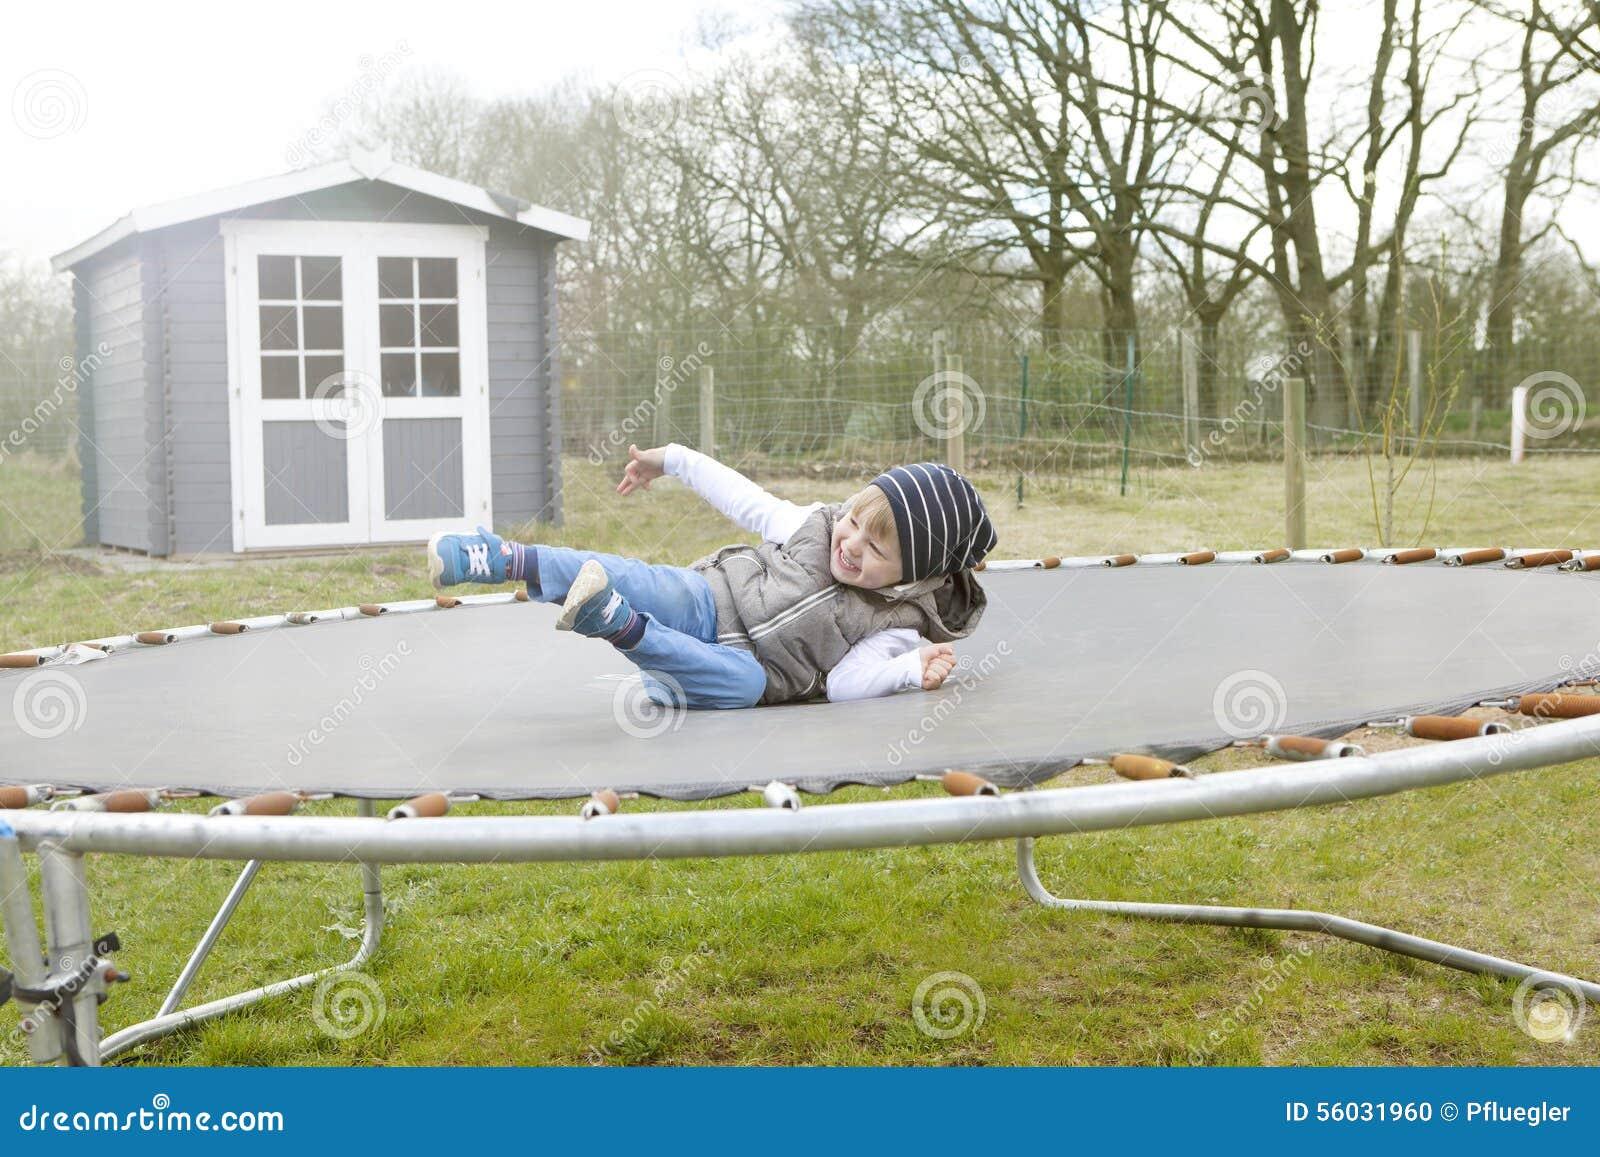 Boy Jumping Trampoline Stock Image